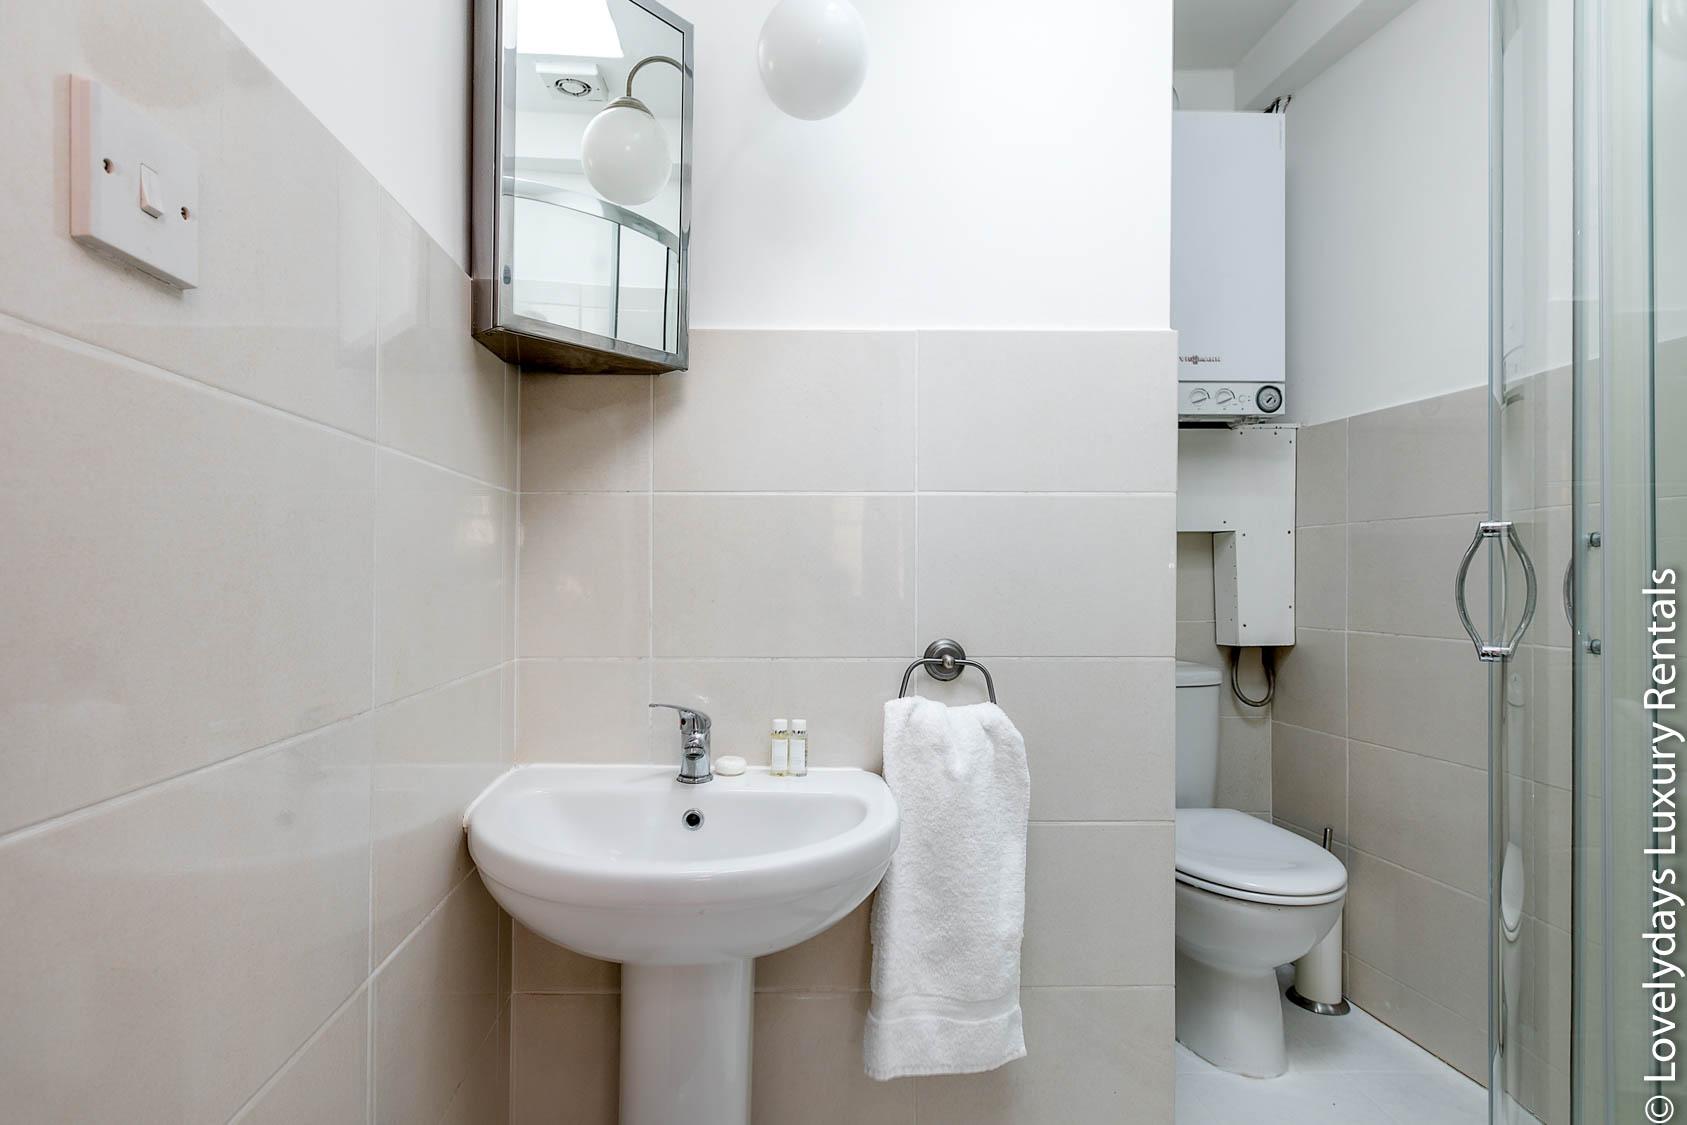 Lovelydays luxury service apartment rental - London - Fitzrovia - Goodge 55 - Lovelysuite - 2 bedrooms - 3 bathrooms - Lovely shower - adb887c96a3c - Lovelydays